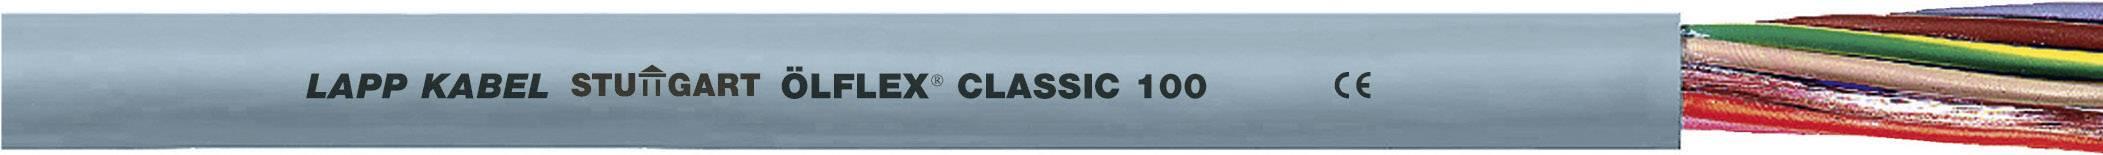 Kabel LappKabel Ölflex CLASSIC 100 7G1,5 (0010068), PVC, 8,9 mm, 500 V, šedá, 100 m